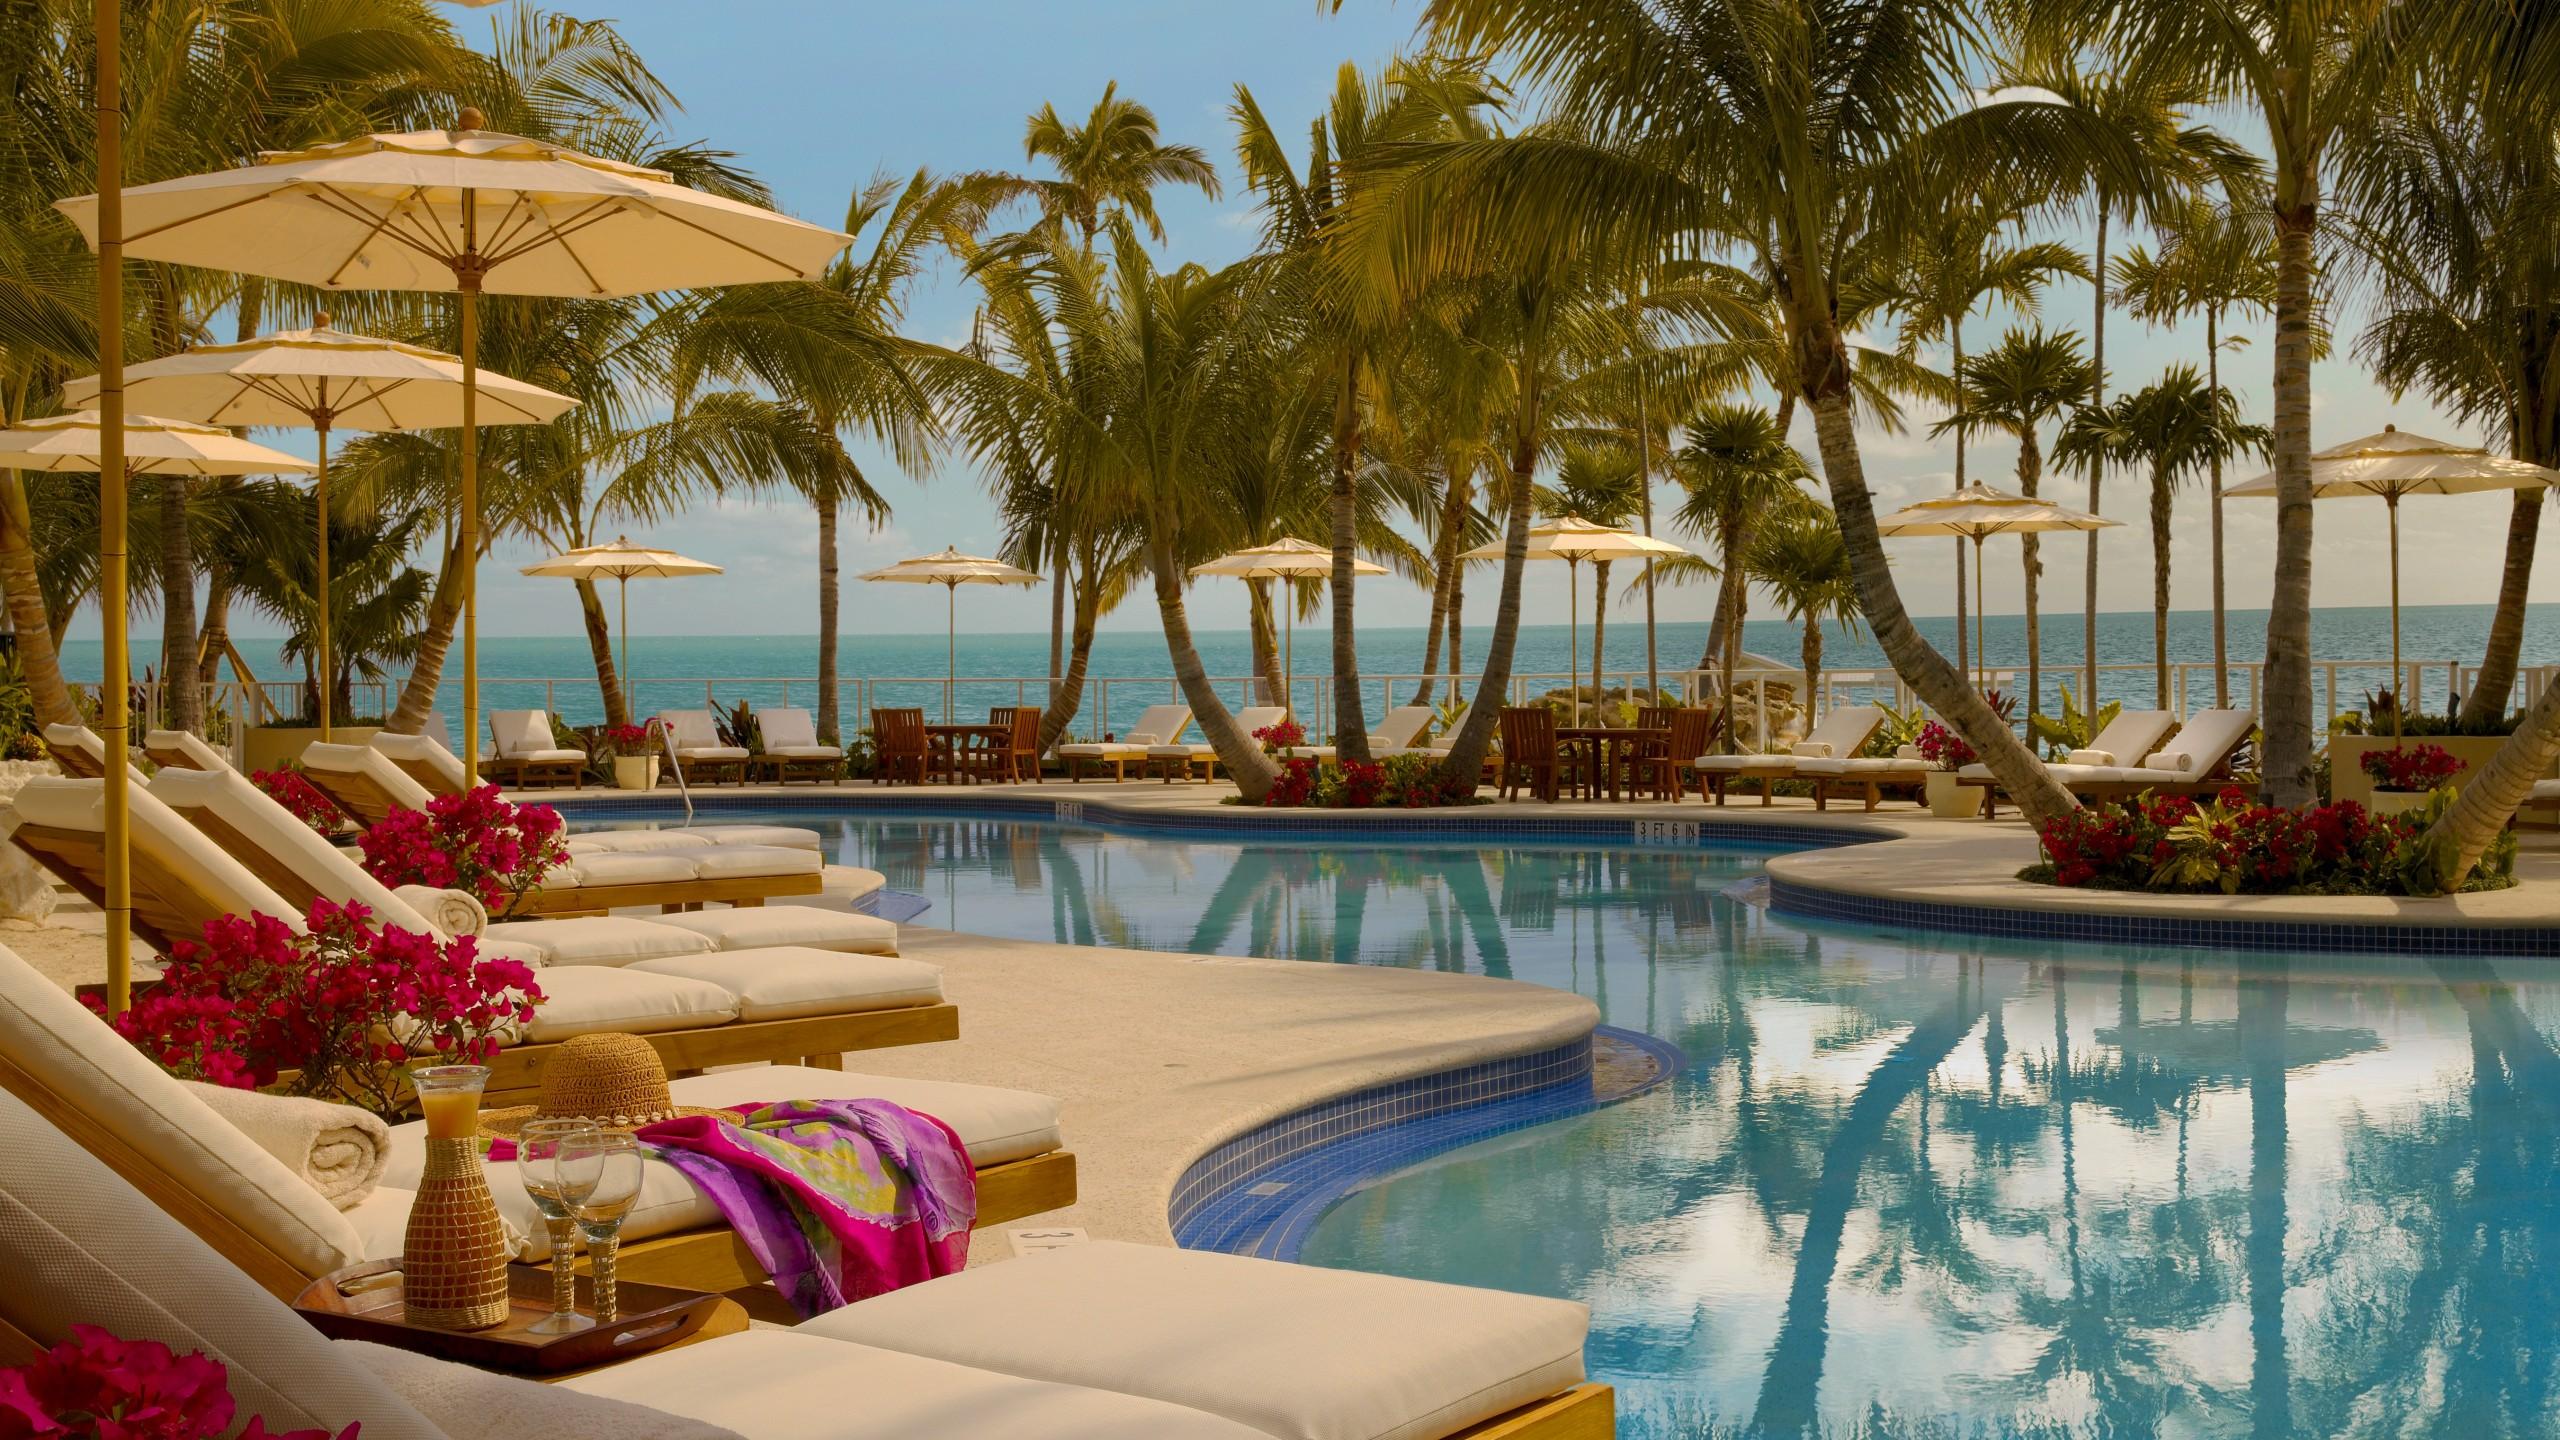 Wallpaper Cheeca Lodge Amp Spa Islamorada Florida Best